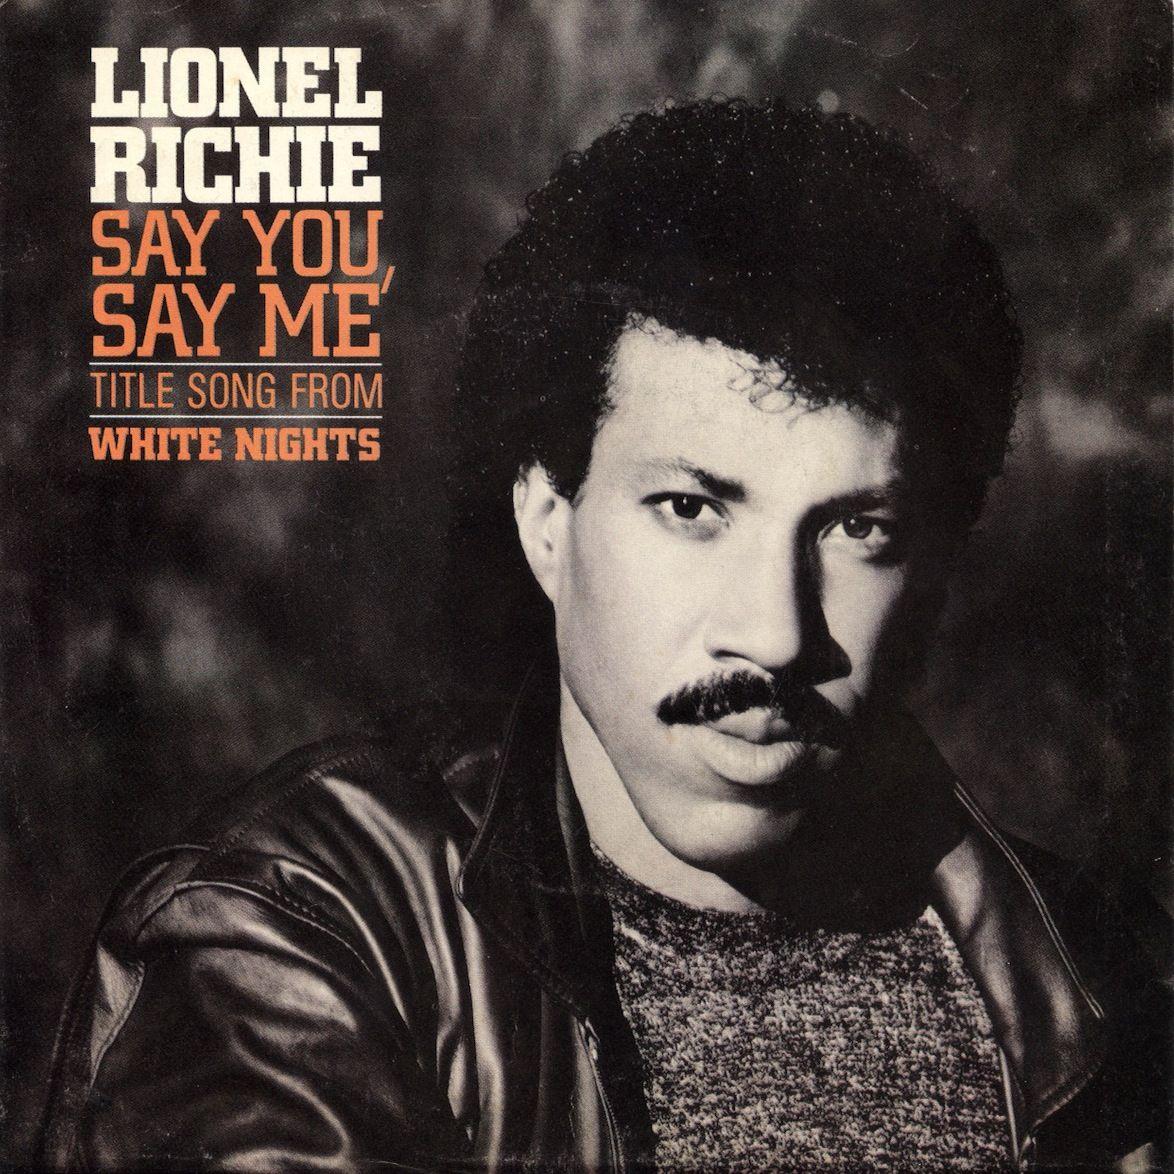 December 21 1985 Lionel Richie Started A 4 Week Run At